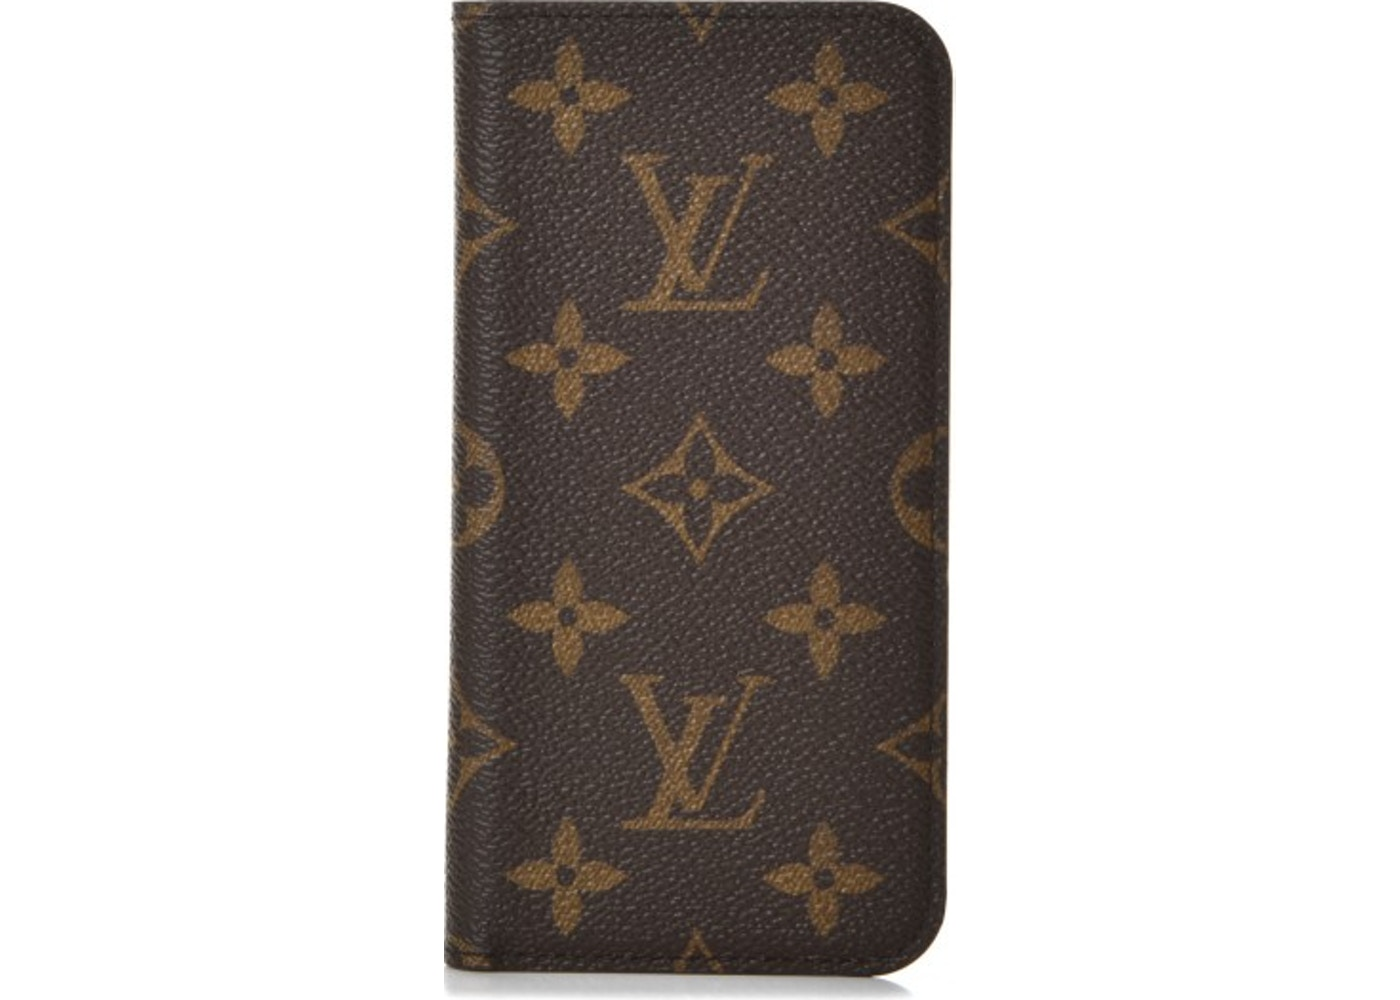 d5003cd3aa0 Louis Vuitton Folio Case iPhone X Monogram Brown. Monogram Brown